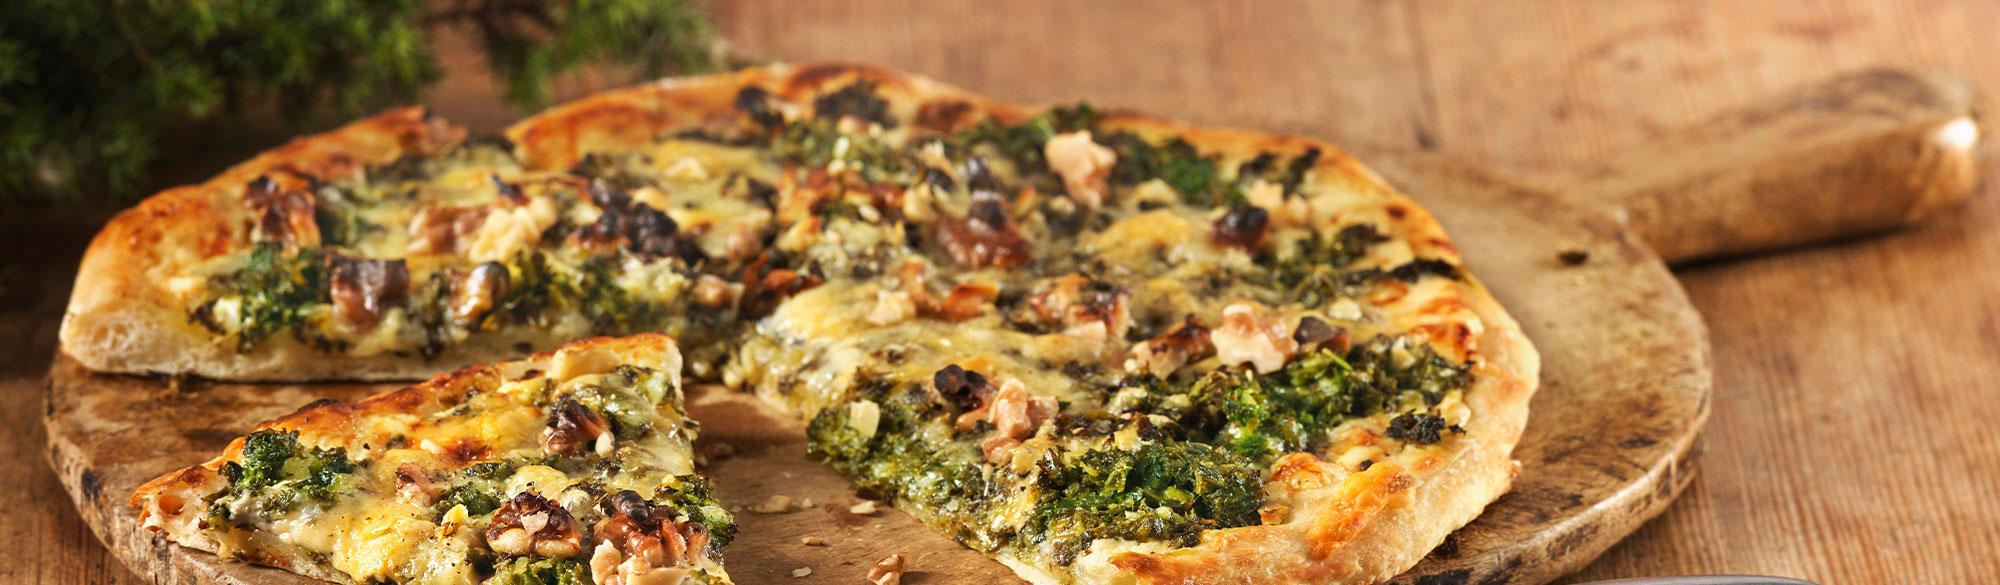 Pizza Bianco med grönkål